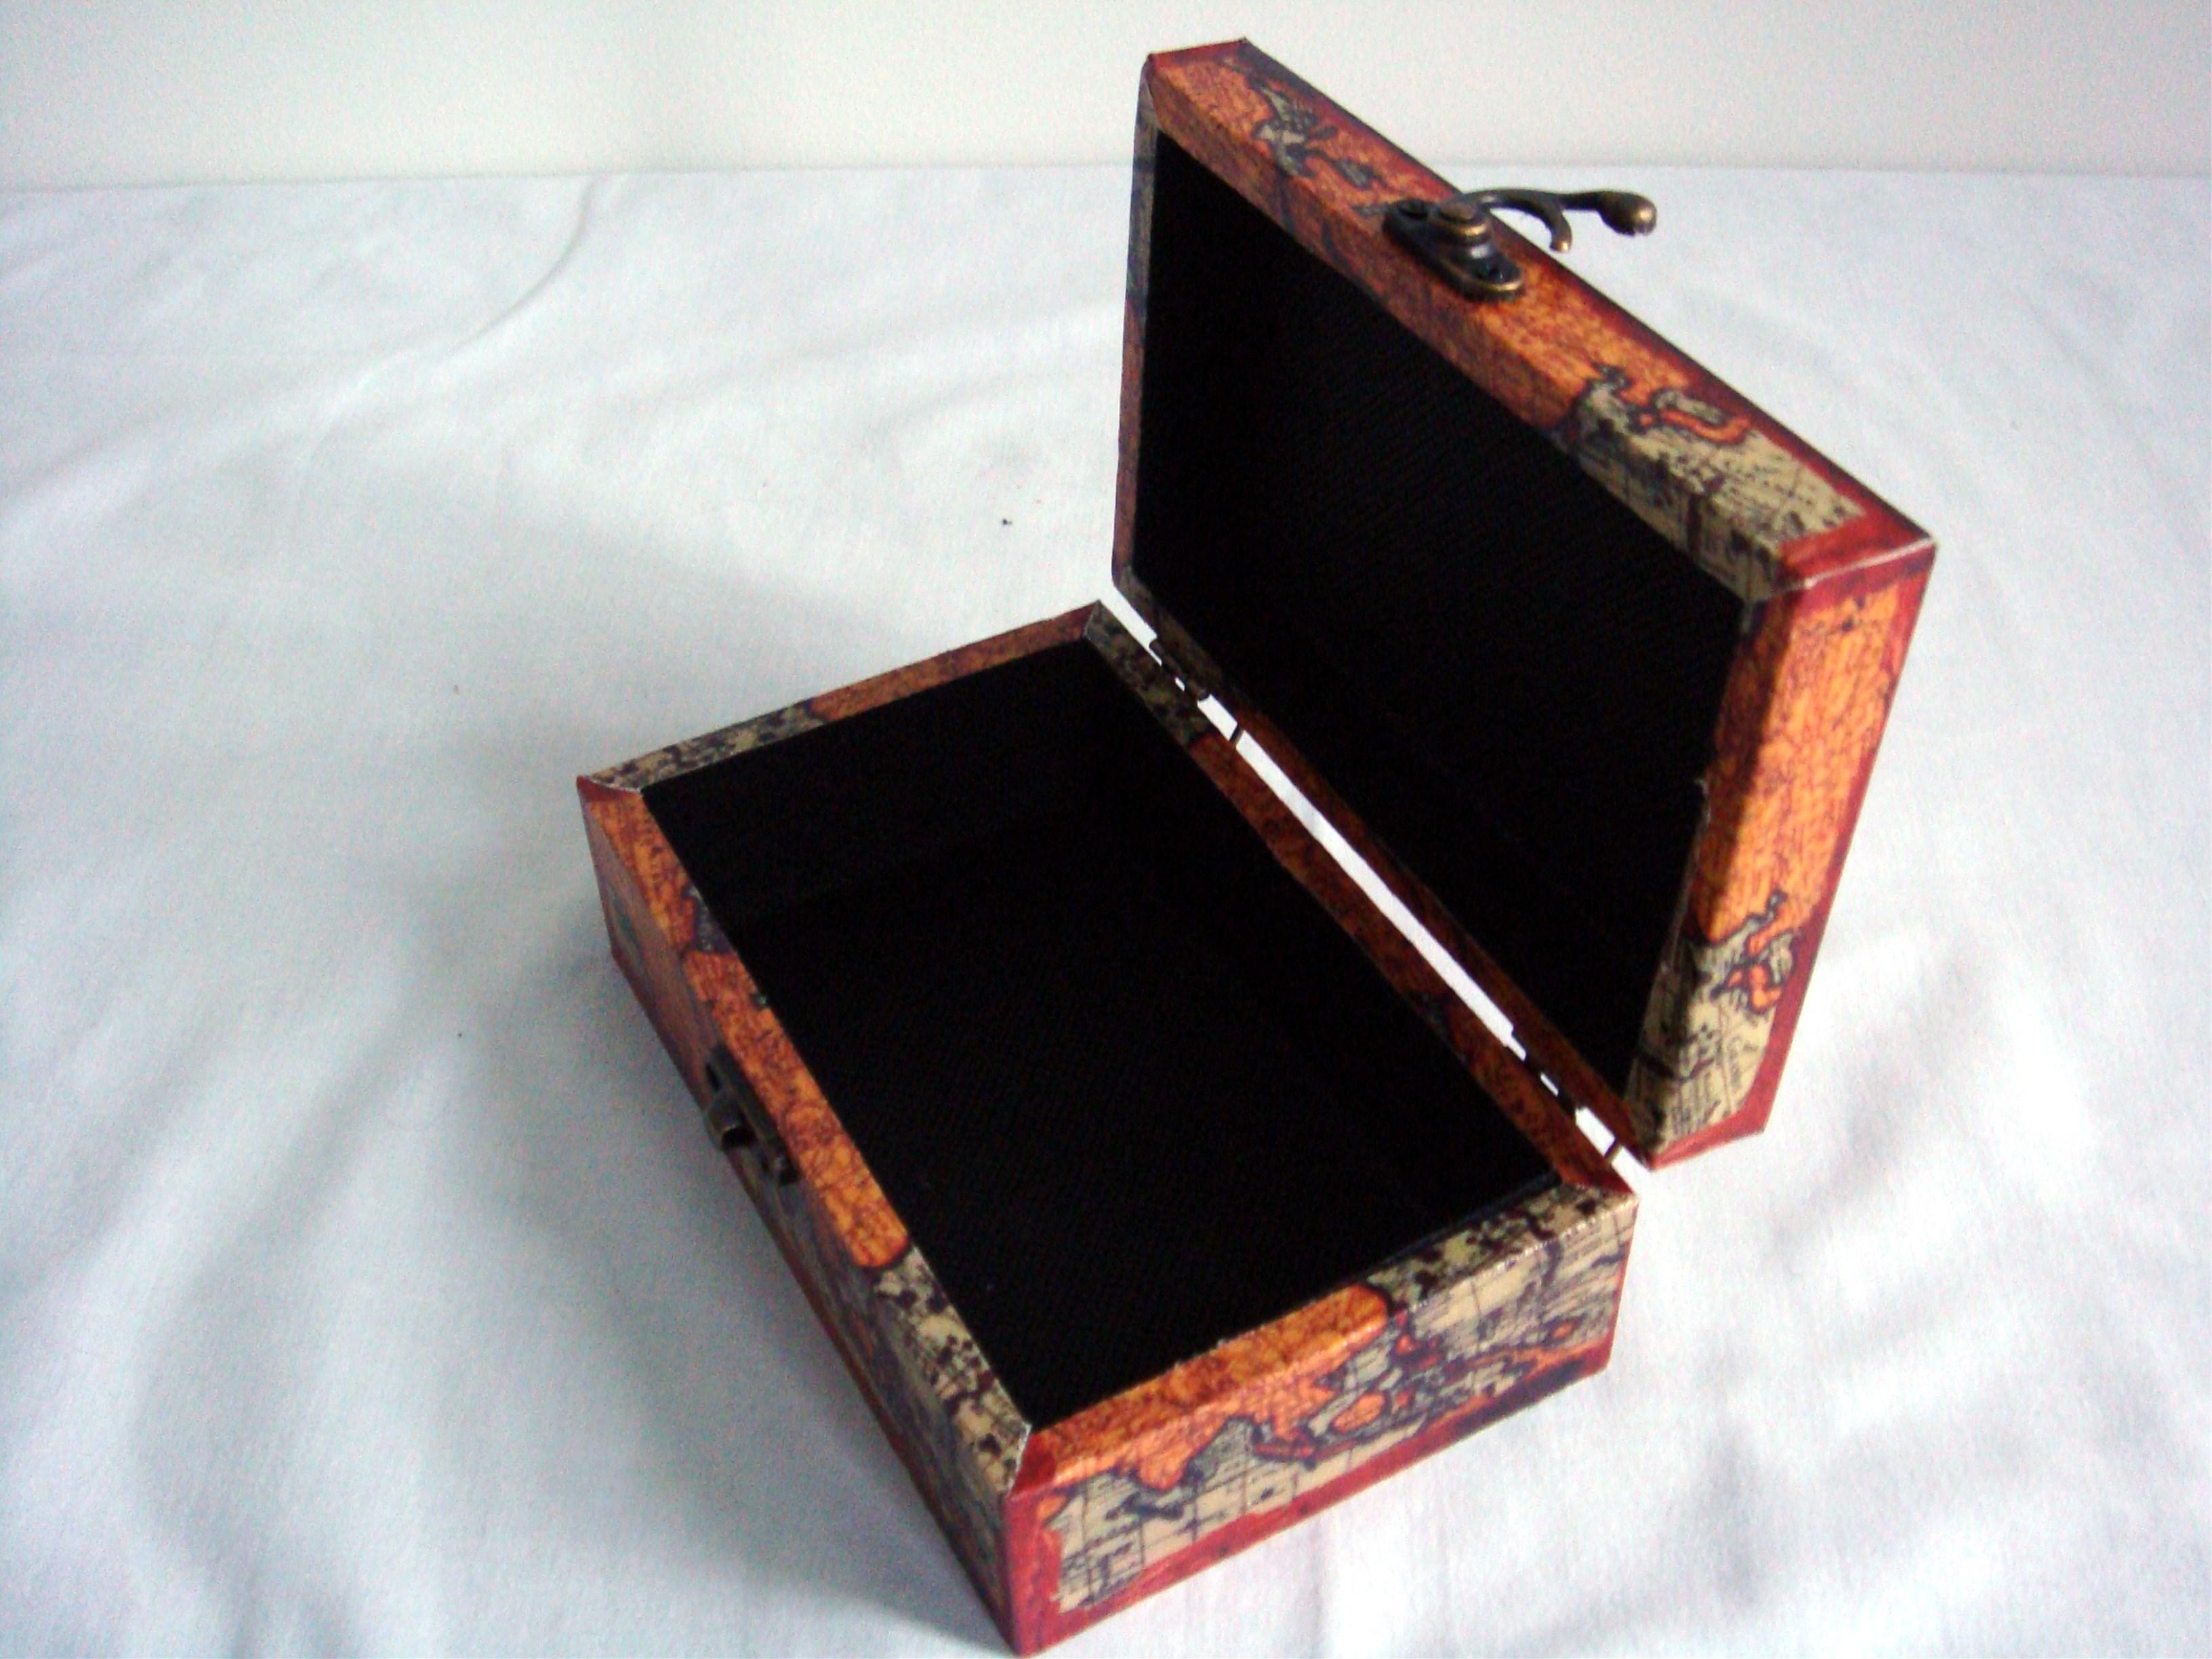 4 stk schatulle leinwanddruck truhe kiste aufbewahrung ebay. Black Bedroom Furniture Sets. Home Design Ideas